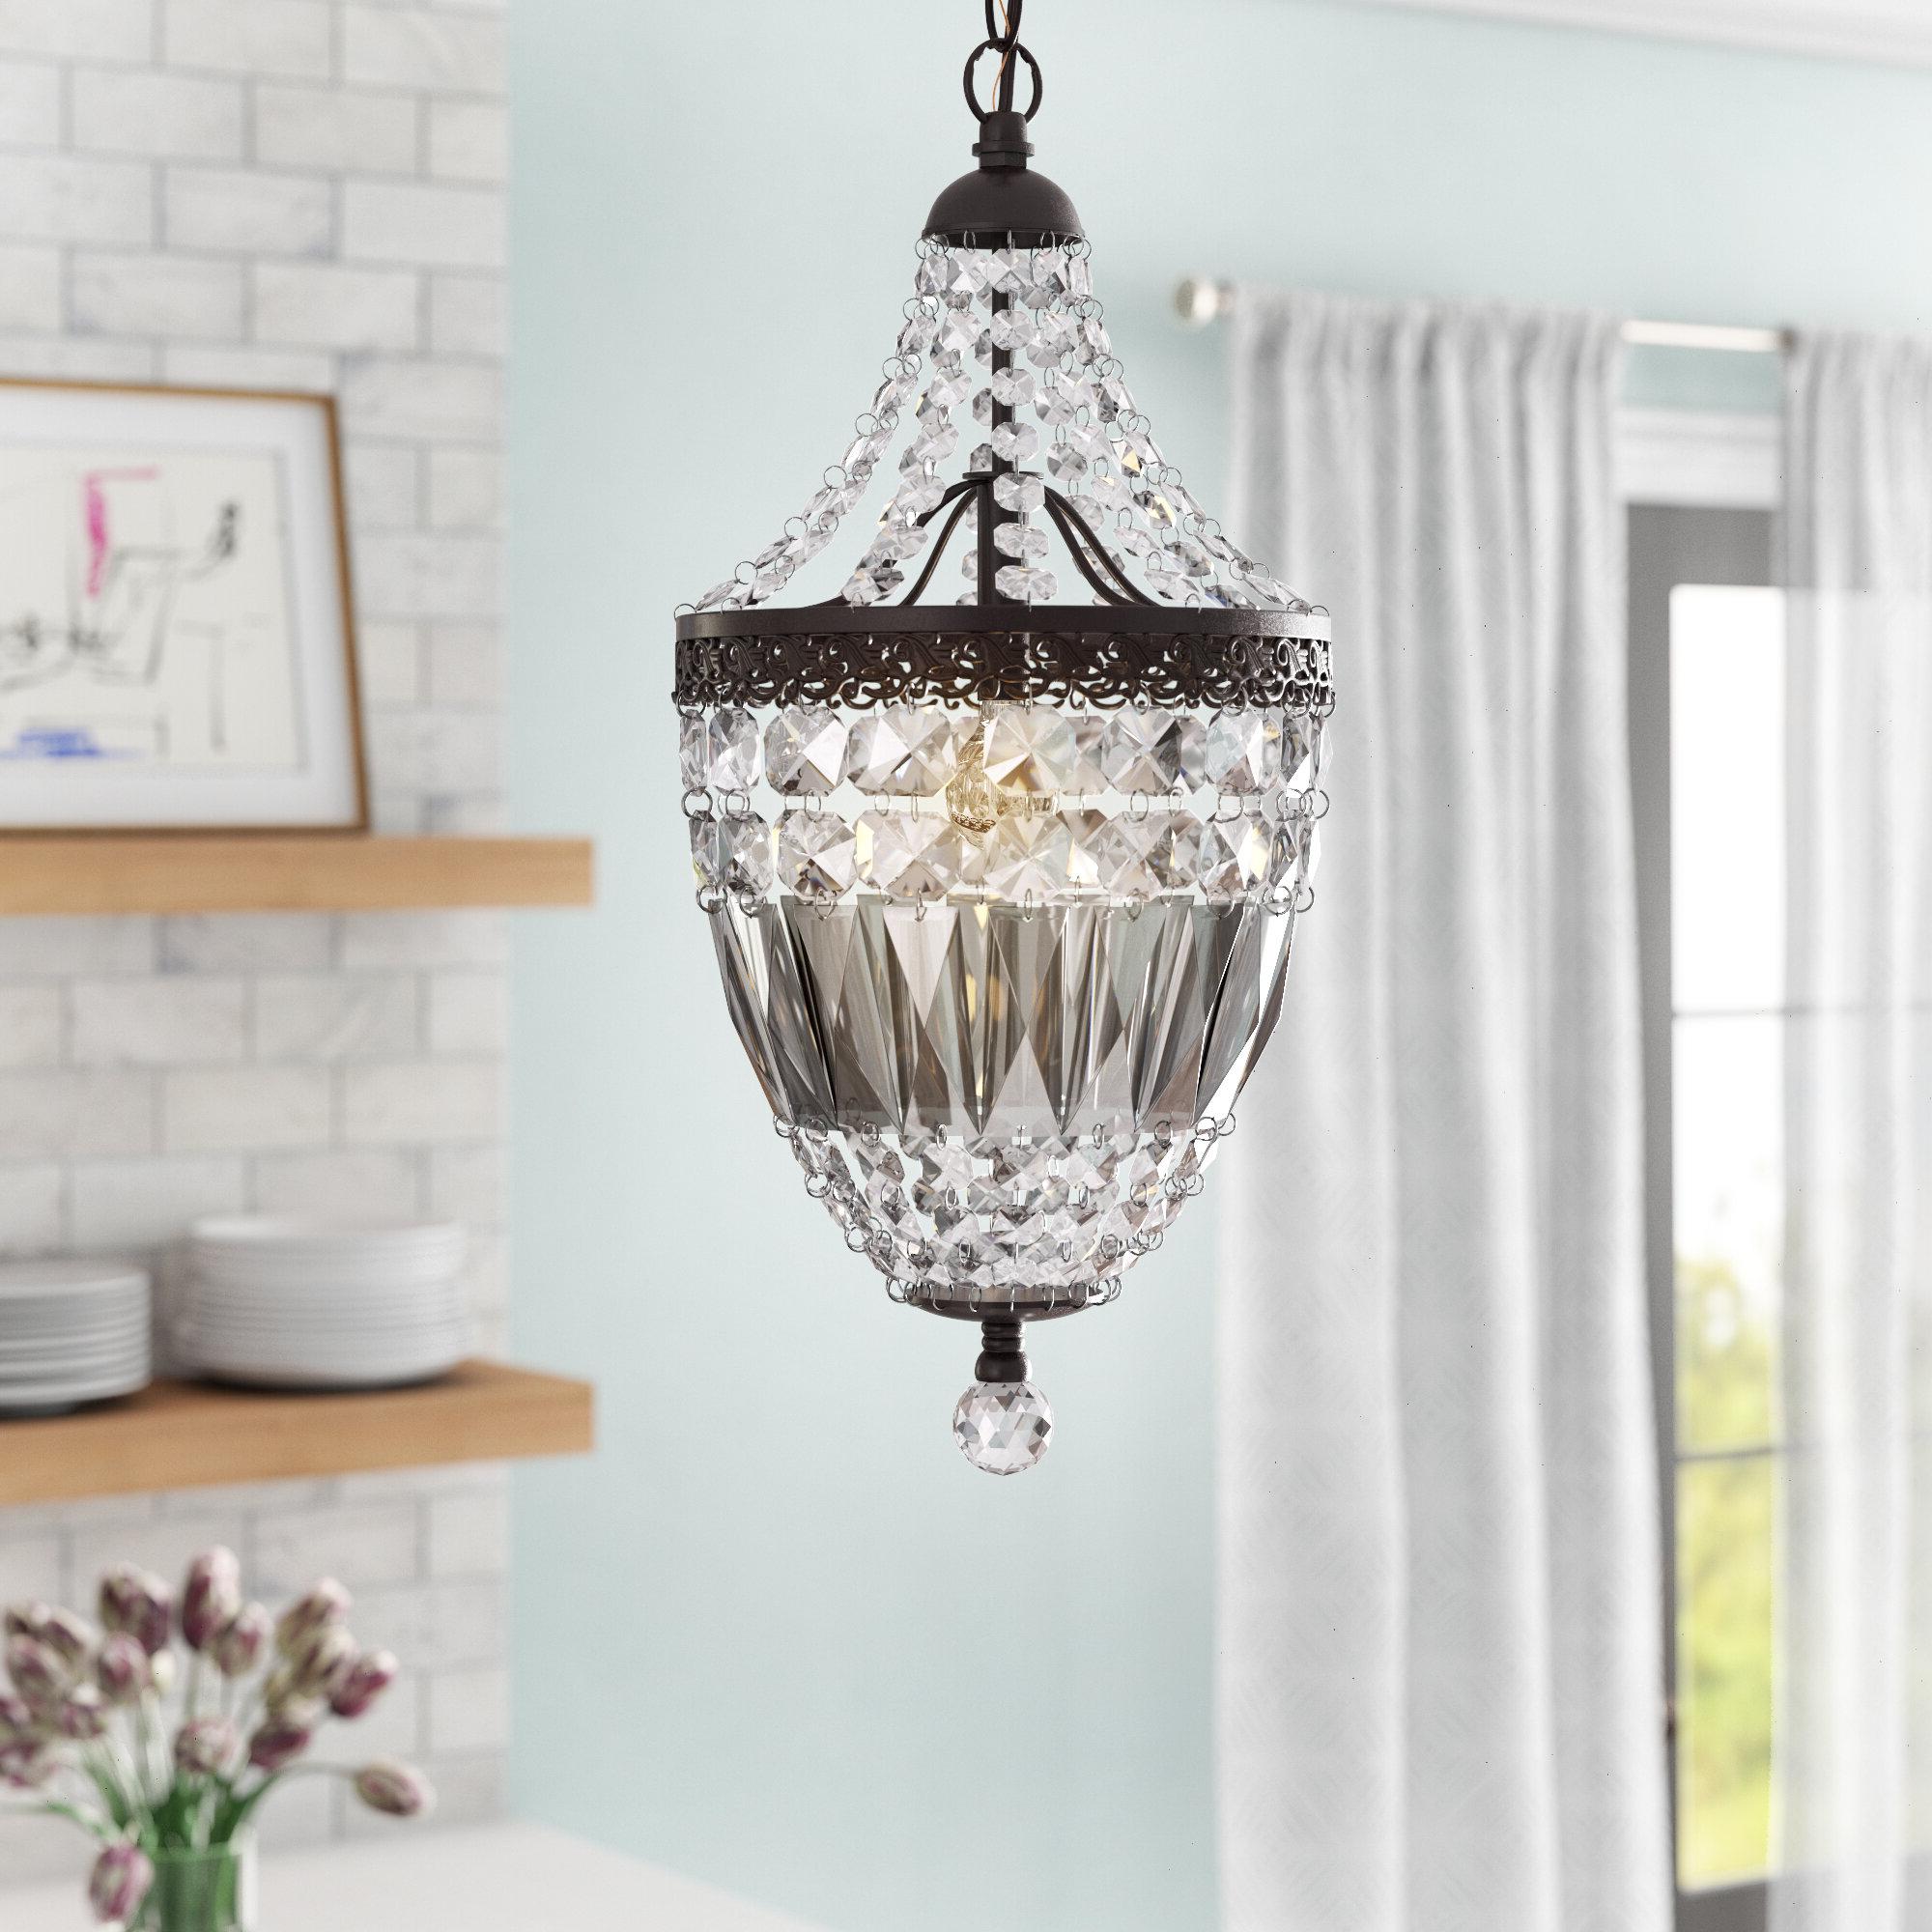 Featured Photo of Spokane 1 Light Single Urn Pendants